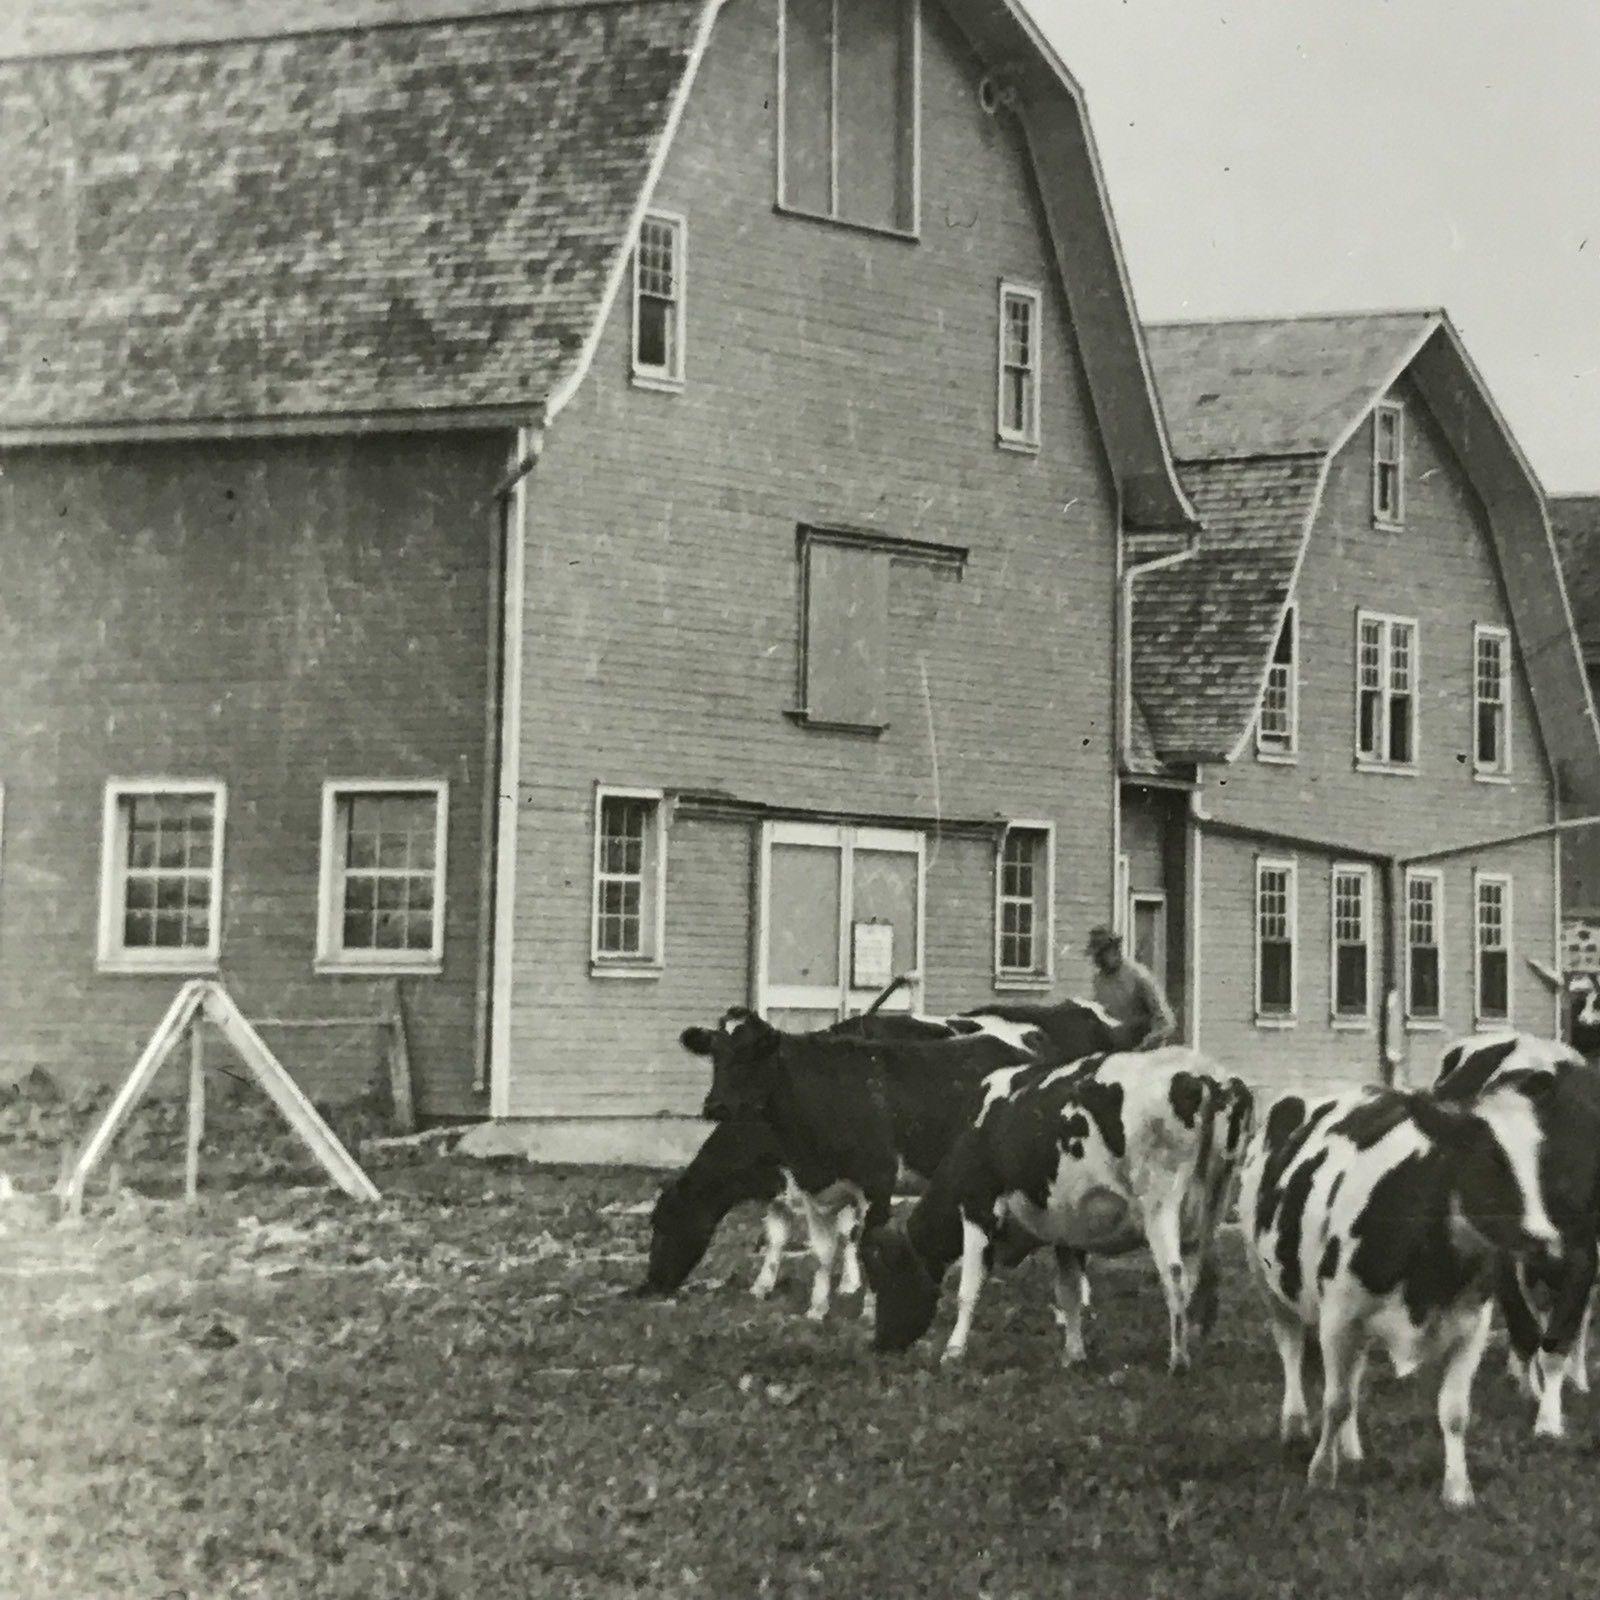 Vtg Keystone Magic Lantern Slide Photo Holstein Cattle Barns Wisconsin